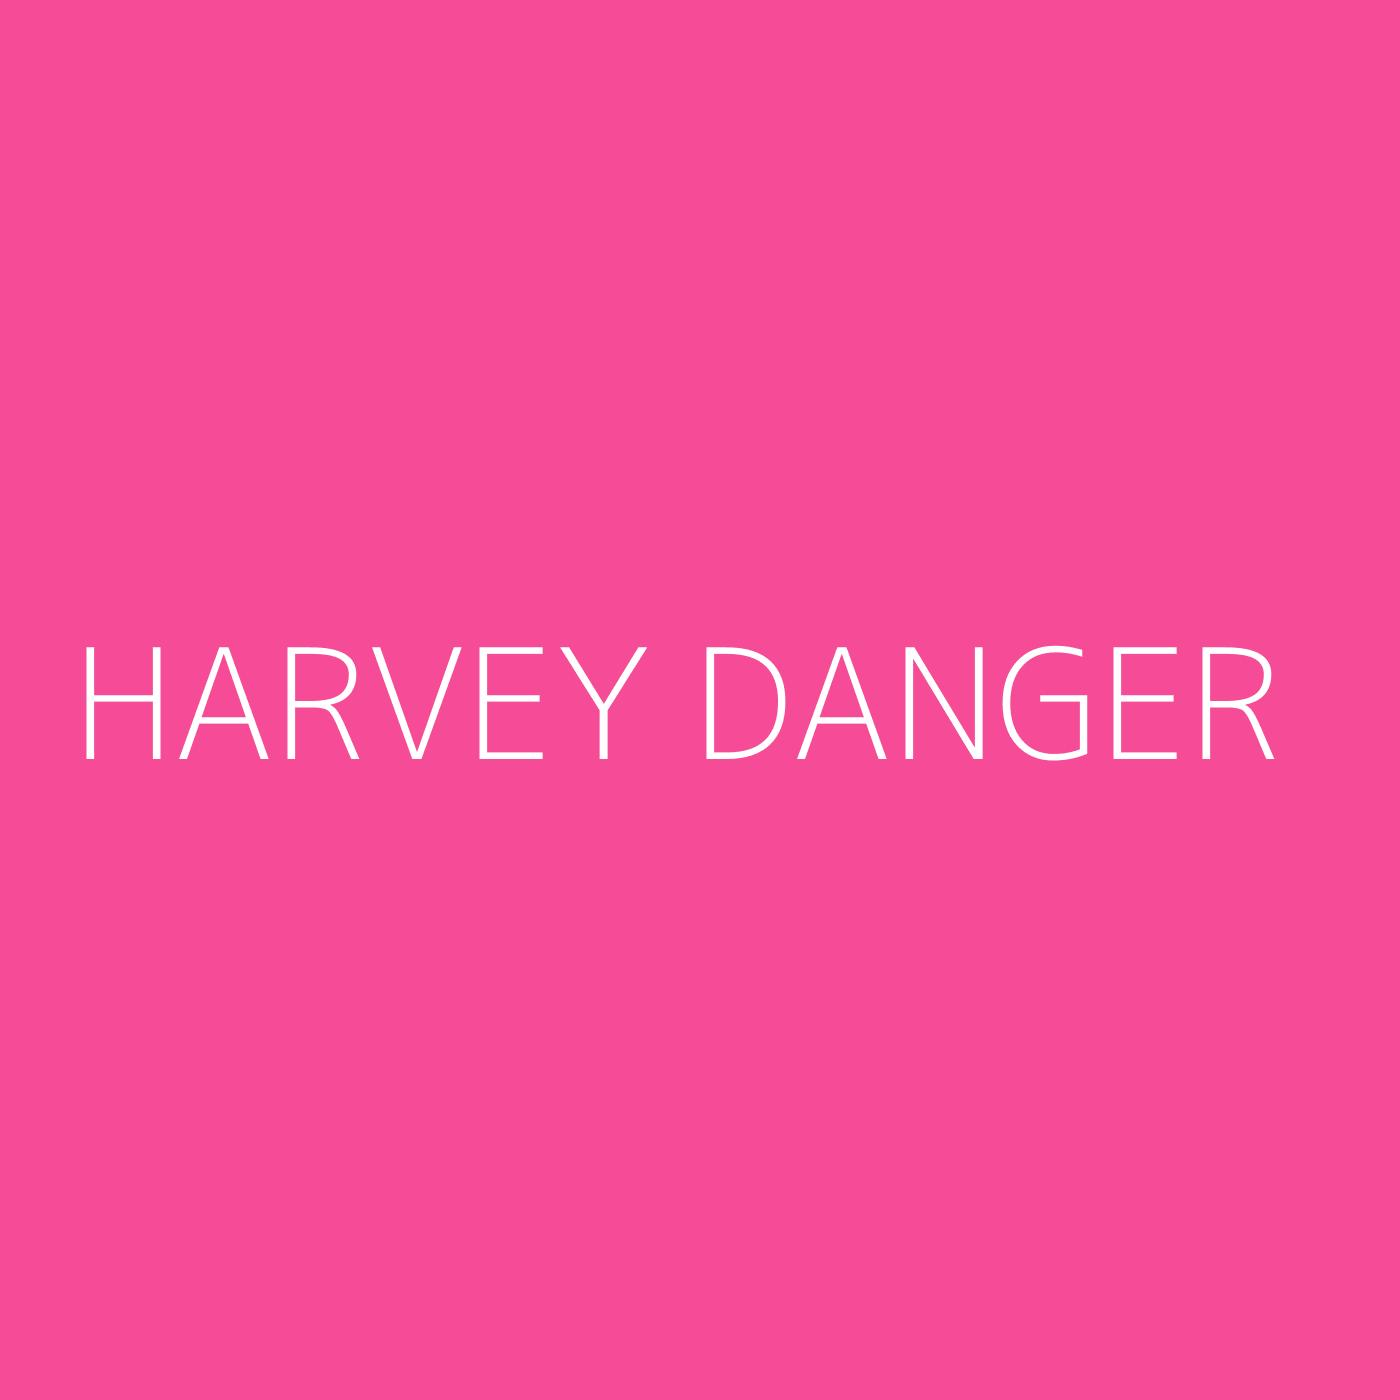 Harvey Danger Playlist Artwork